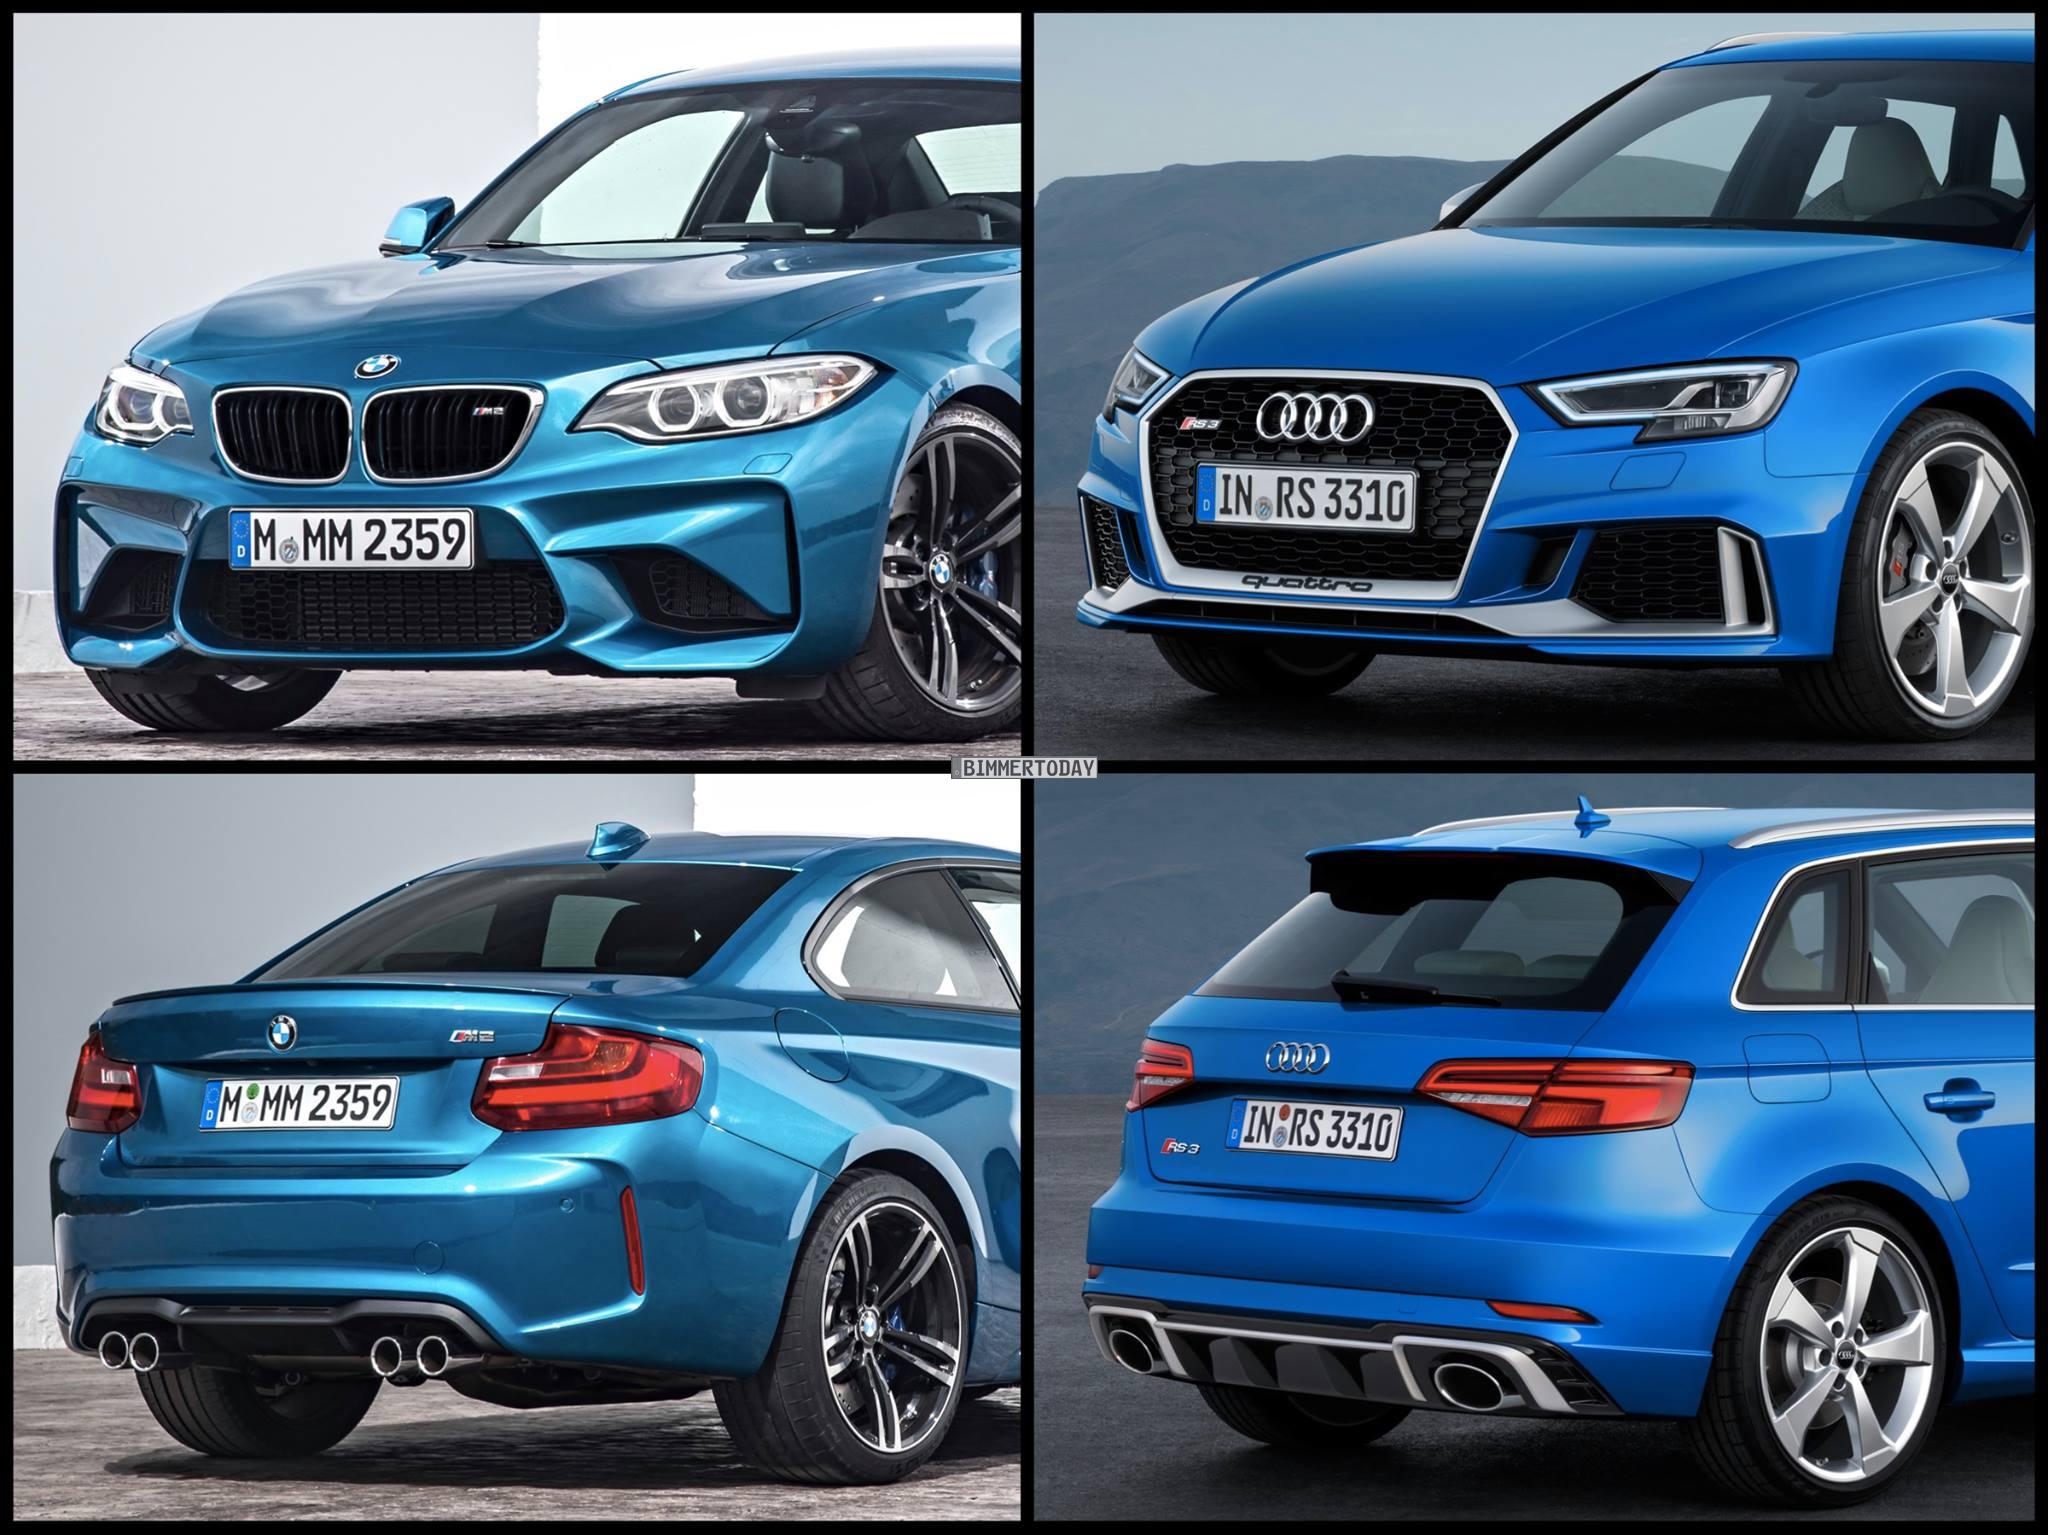 Sedan Vs Coupe >> Photo Comparison: BMW M2 vs Audi RS3 Sportback Facelift